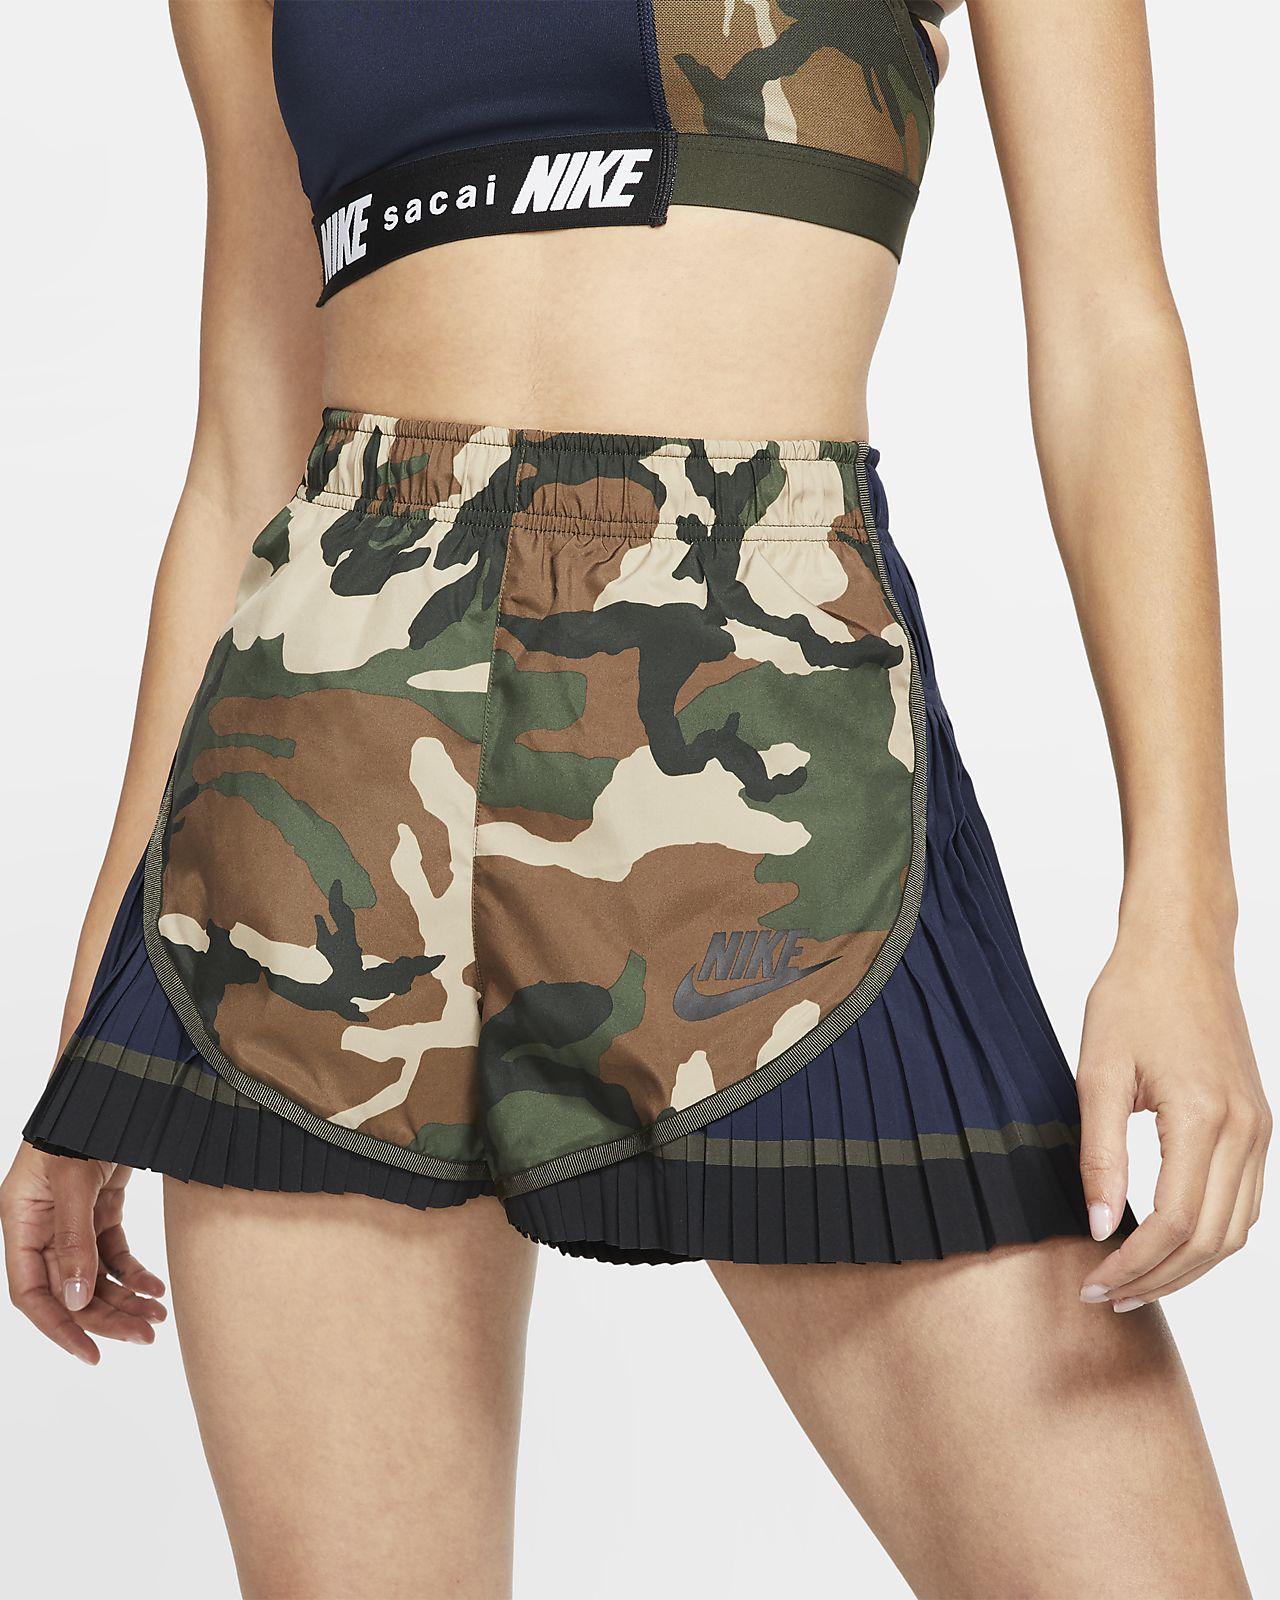 Nike x Sacai Pantalón corto plisado Tempo con estampado de camuflaje - Mujer